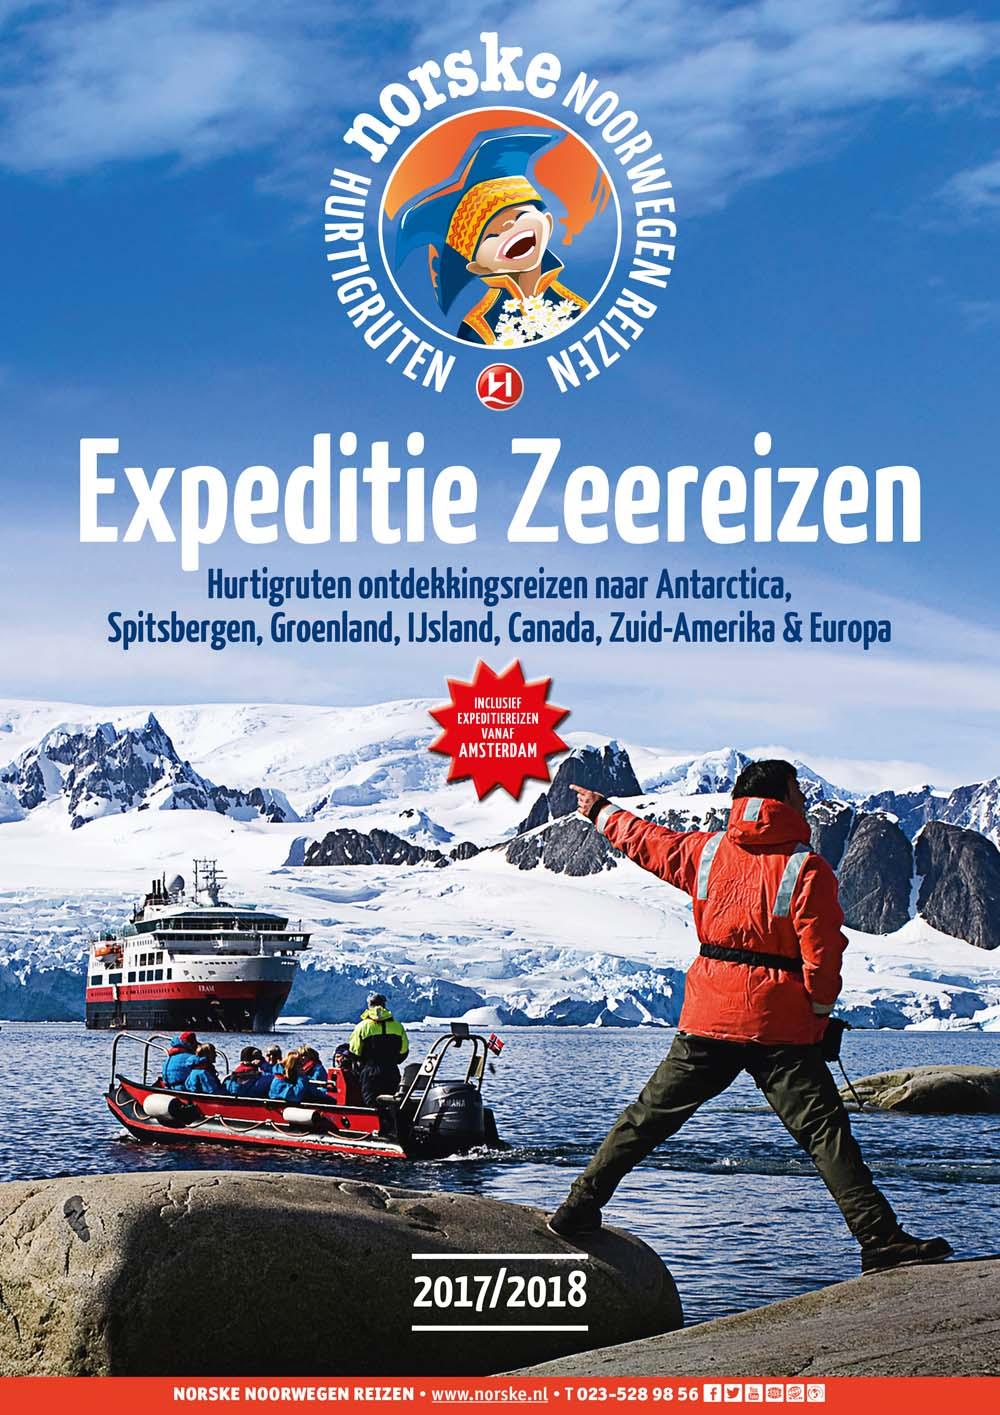 Hurtigruten Expeditie-Zeereizen 2017-2018